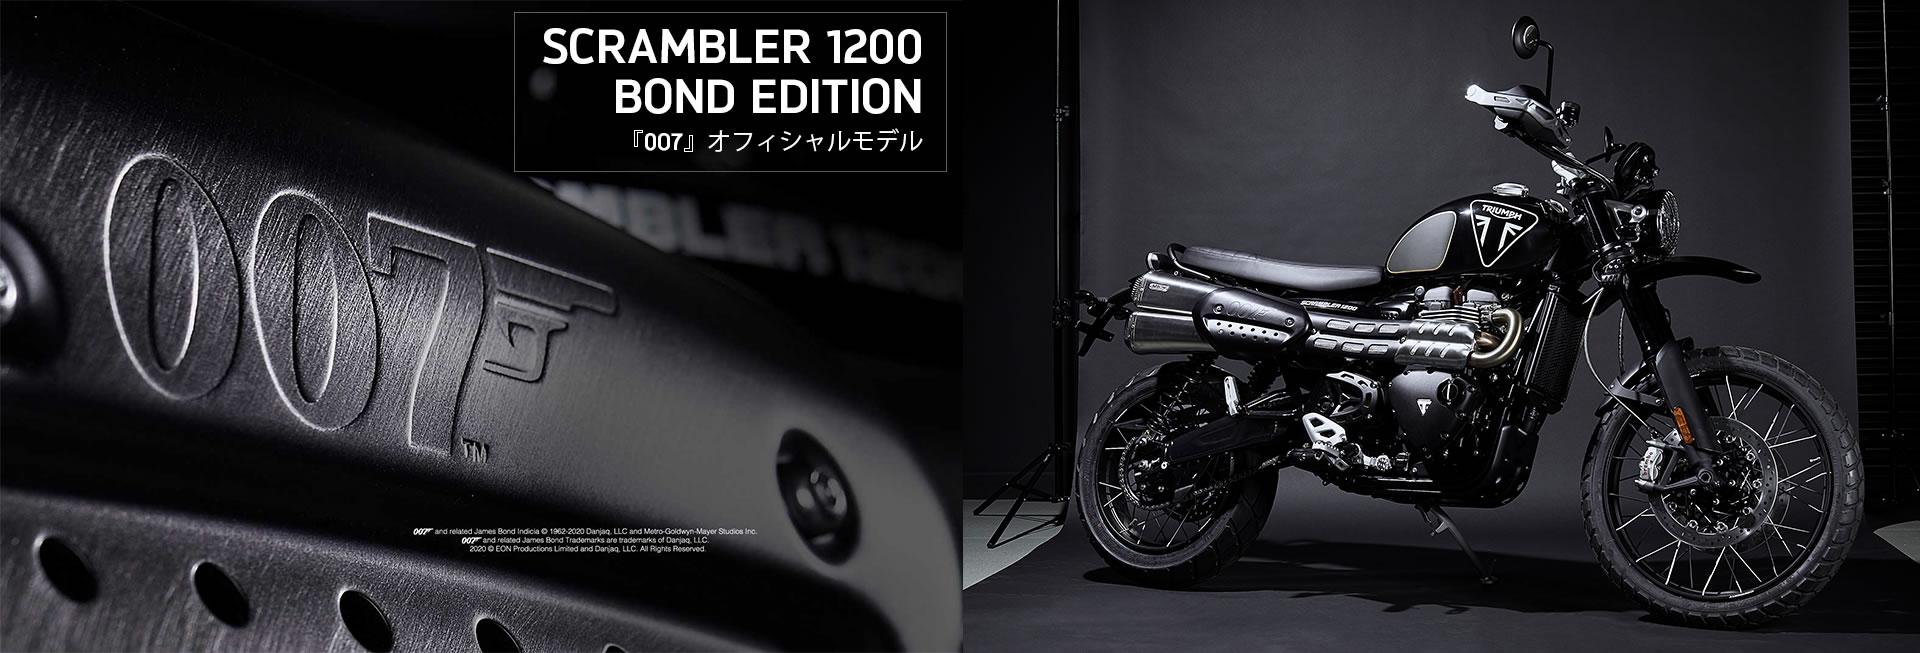 SCRAMBLER 1200 BOND EDITION『007』オフィシャルモデル